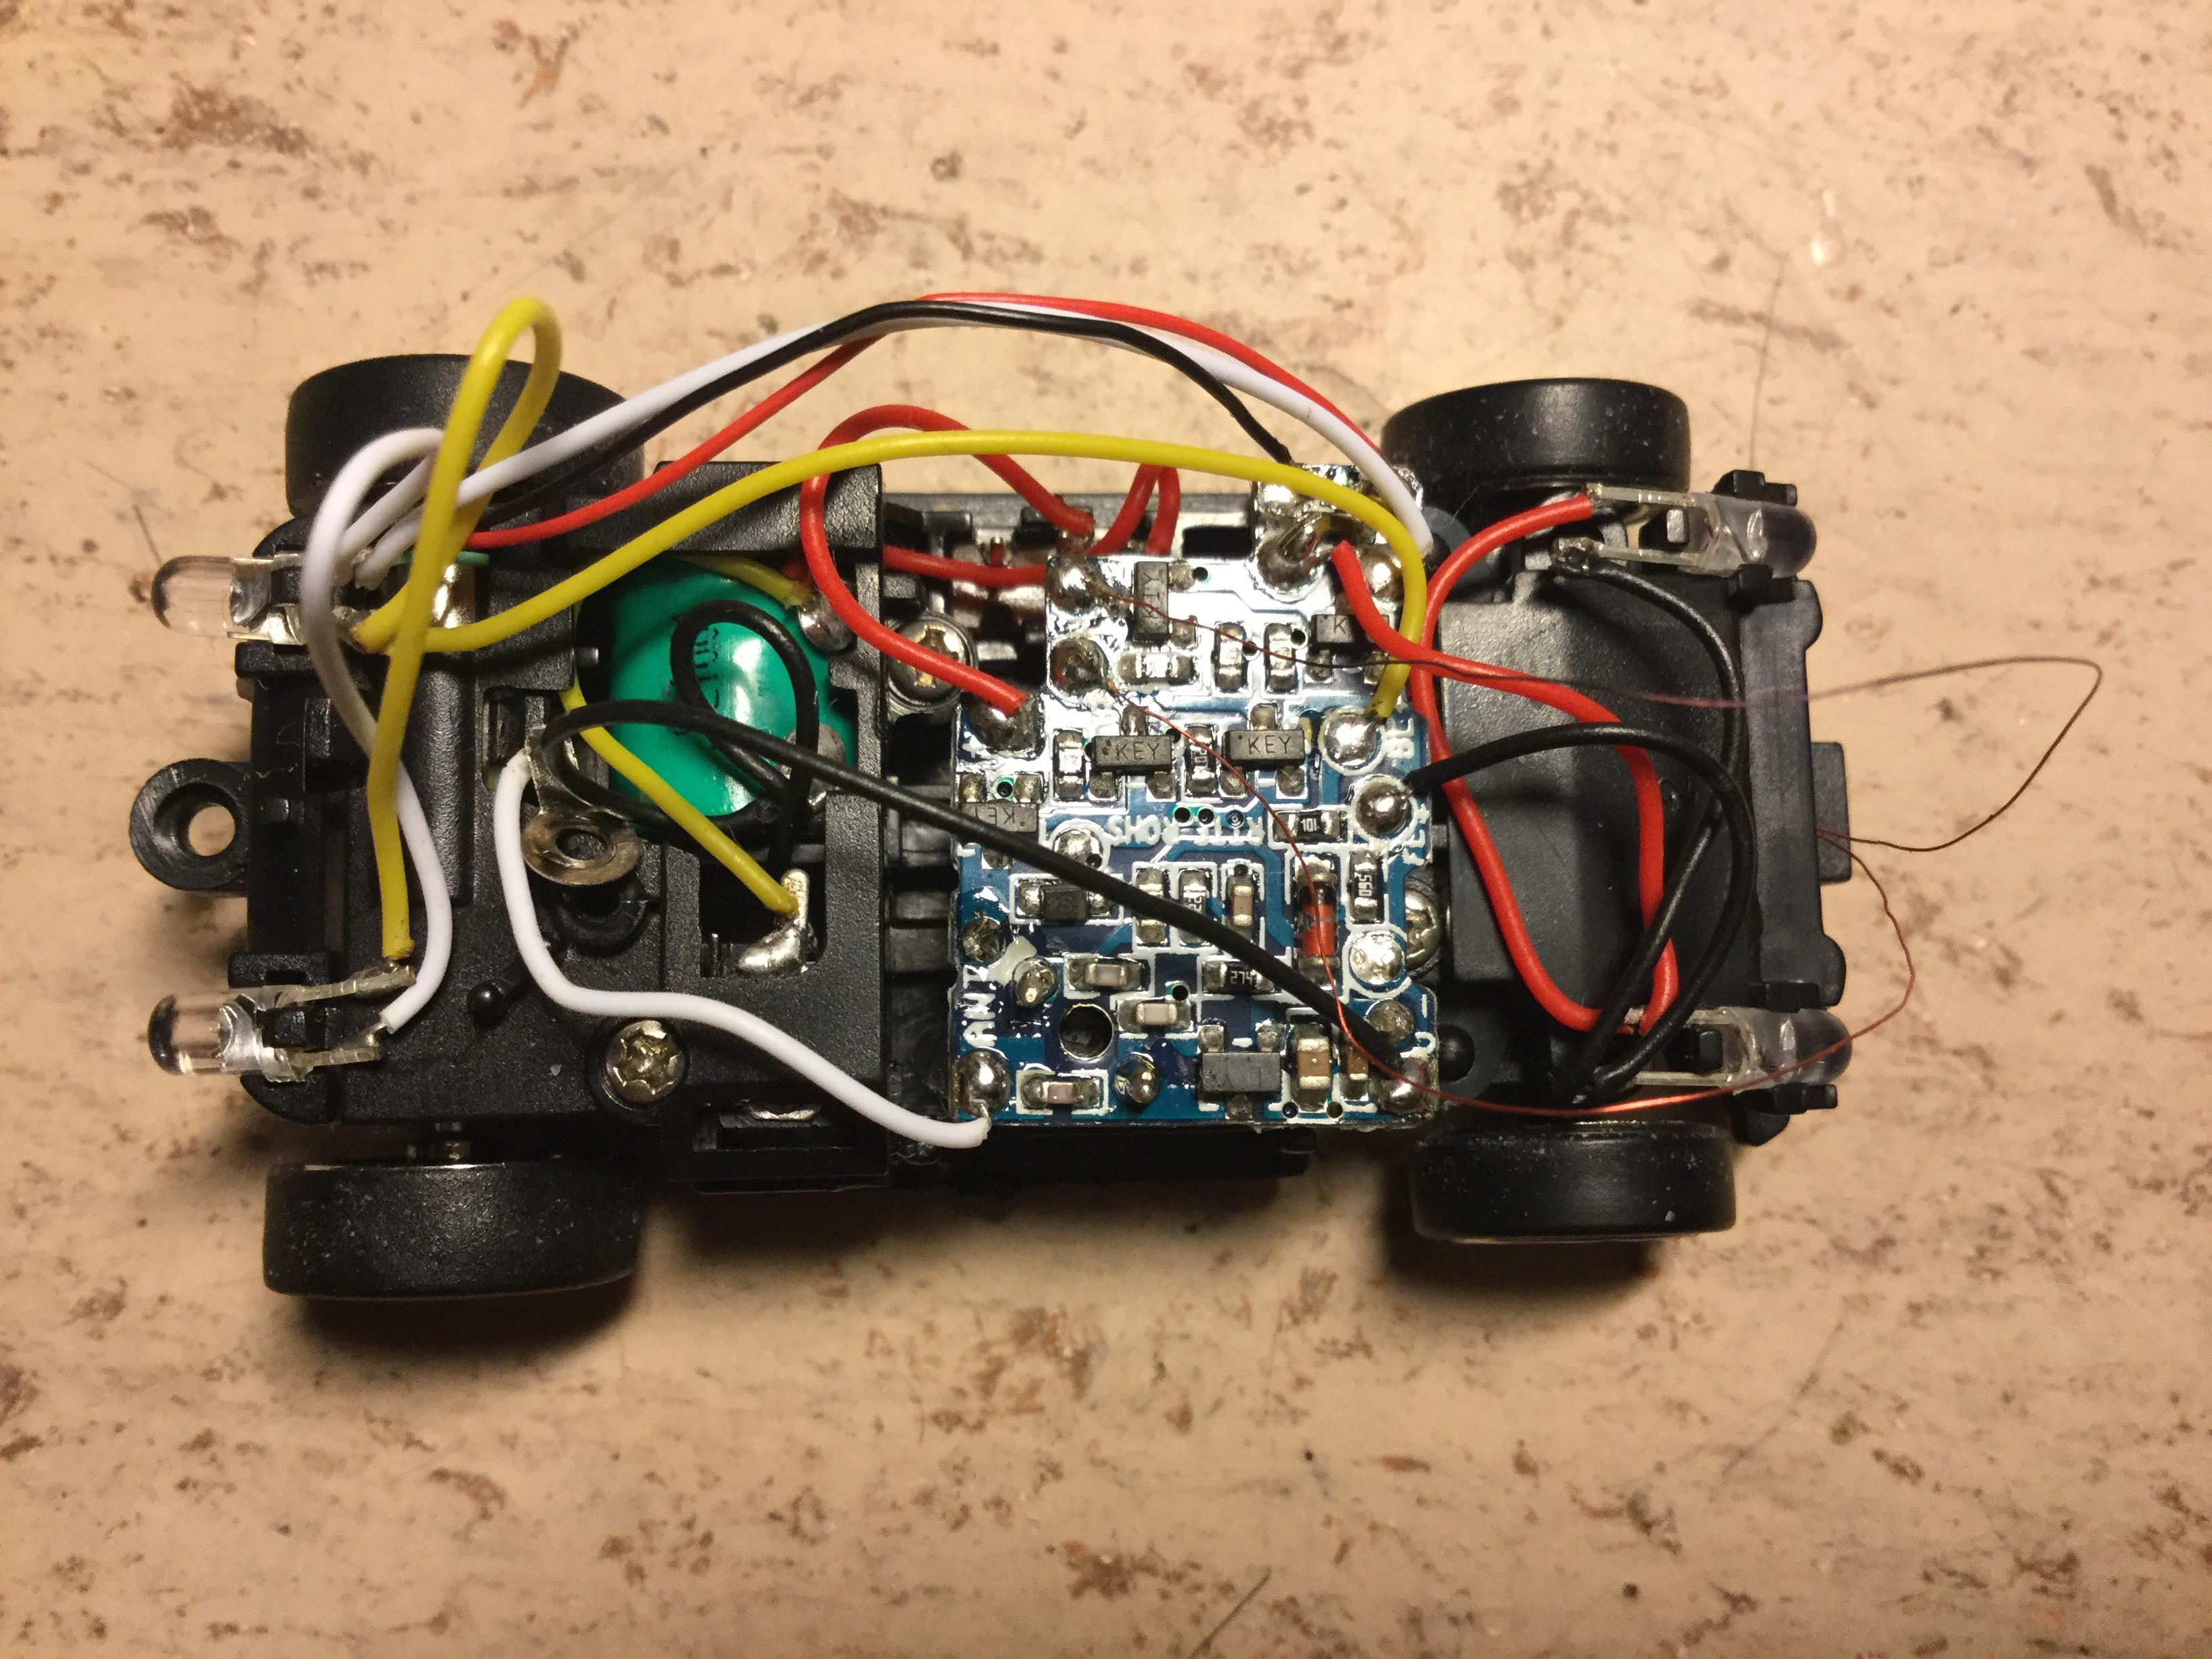 Picture of Micro RC Conversion